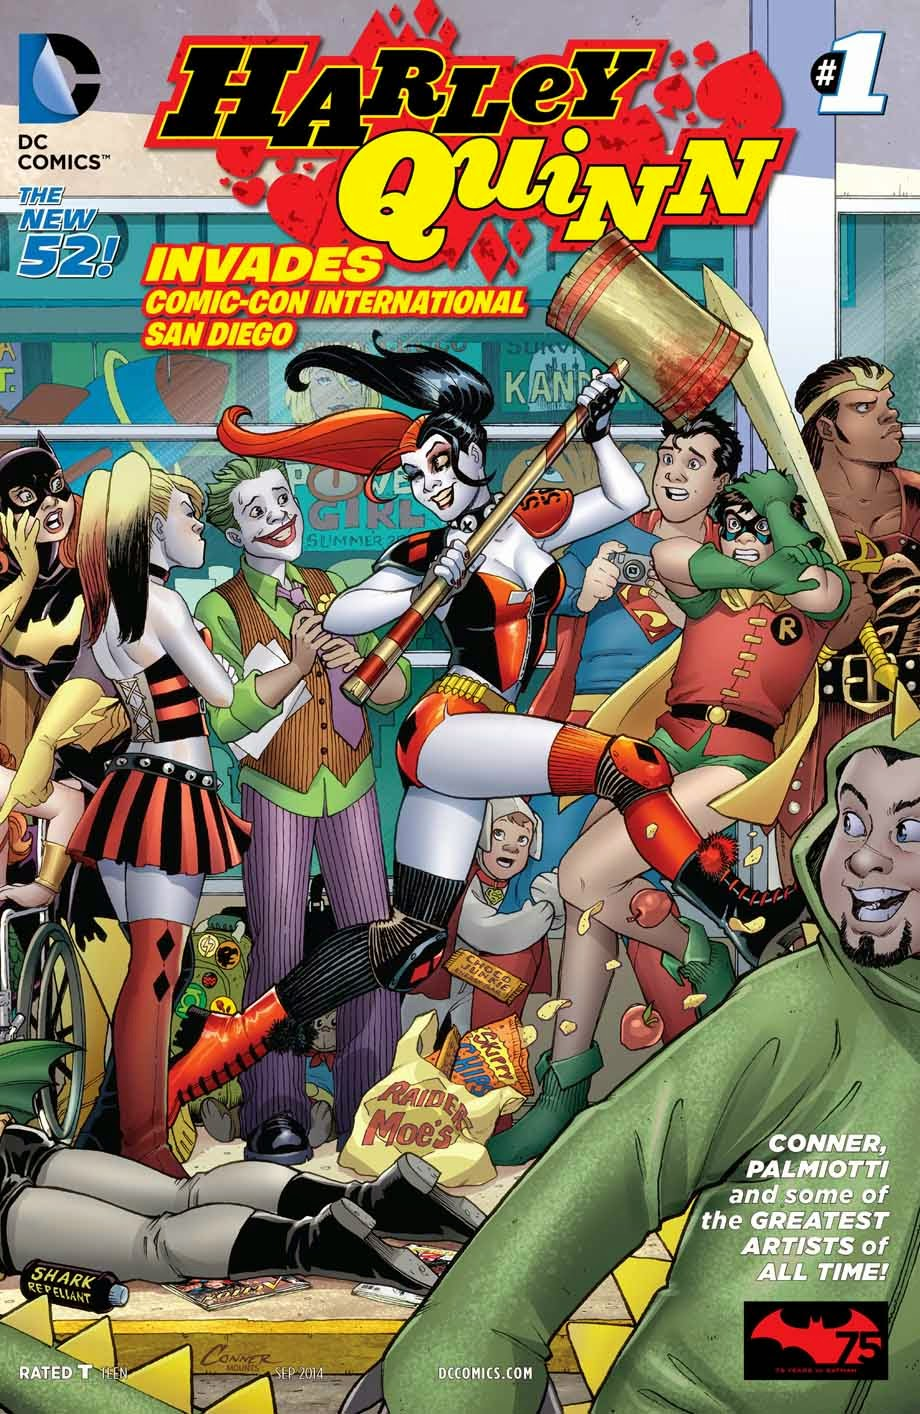 Harley Quinn Invades SDCC